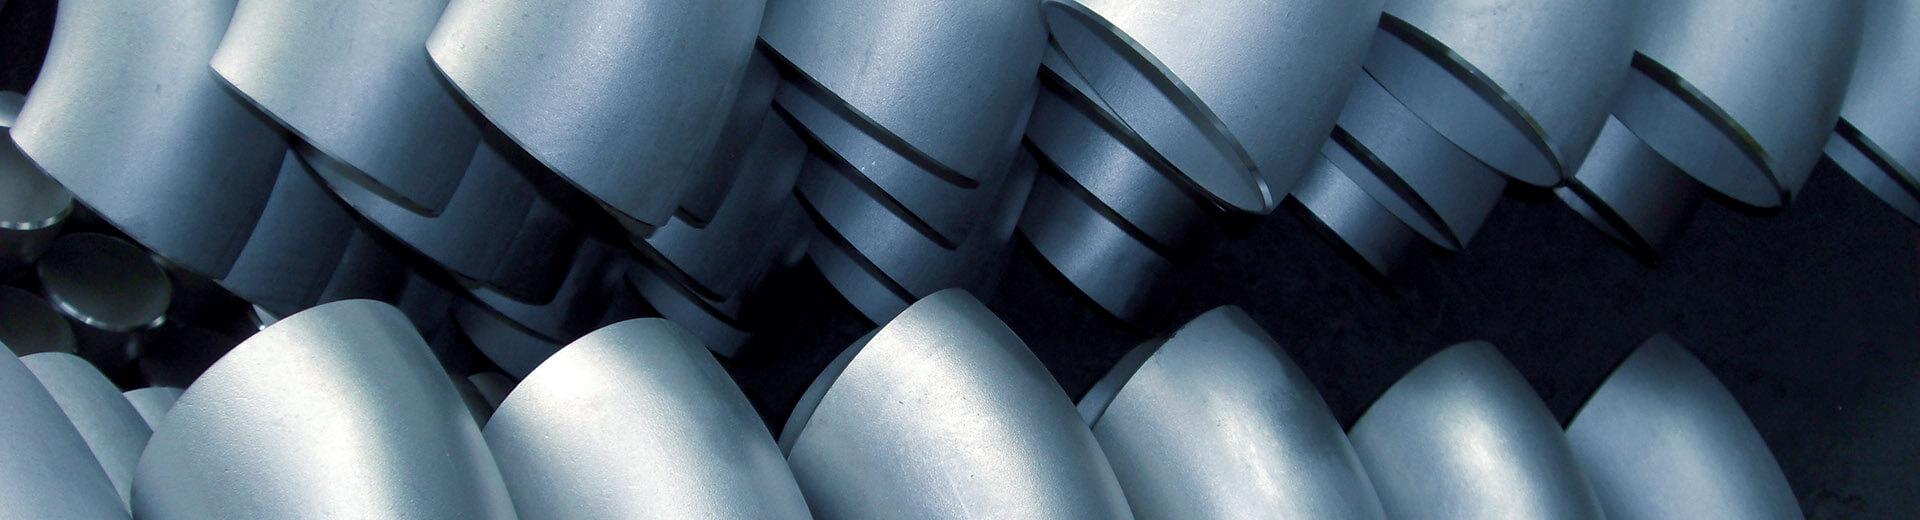 Steeltrade-raccordi-industriali2